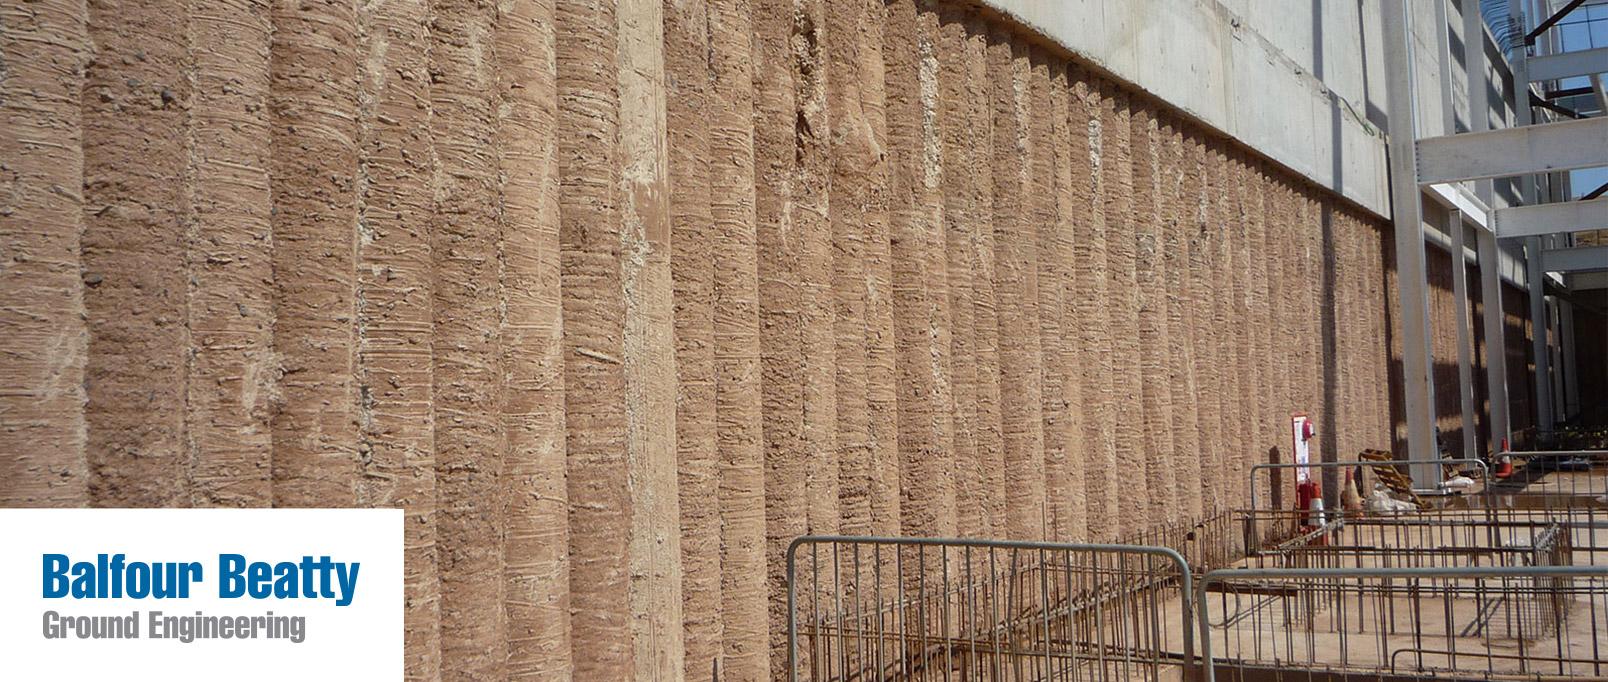 Retaining wallsGround engineeringExpertiseBalfour Beatty plc